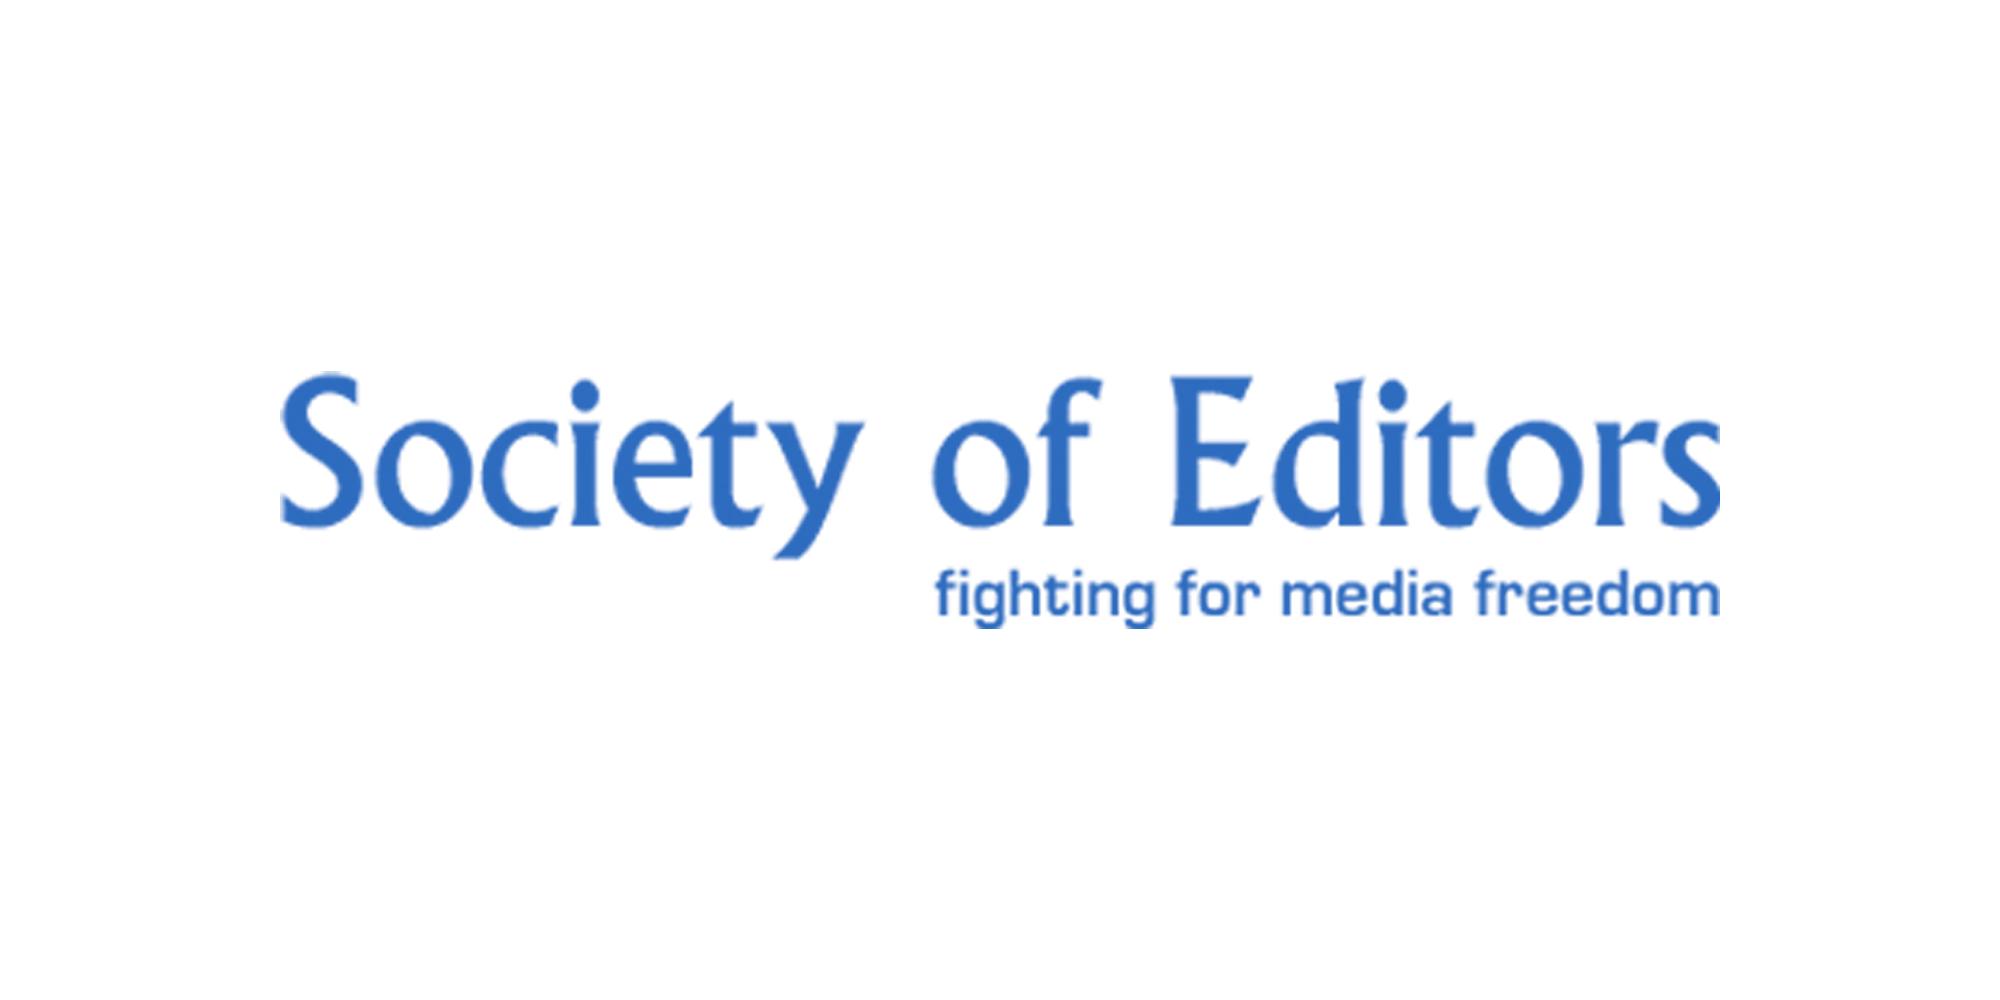 Society of Editors